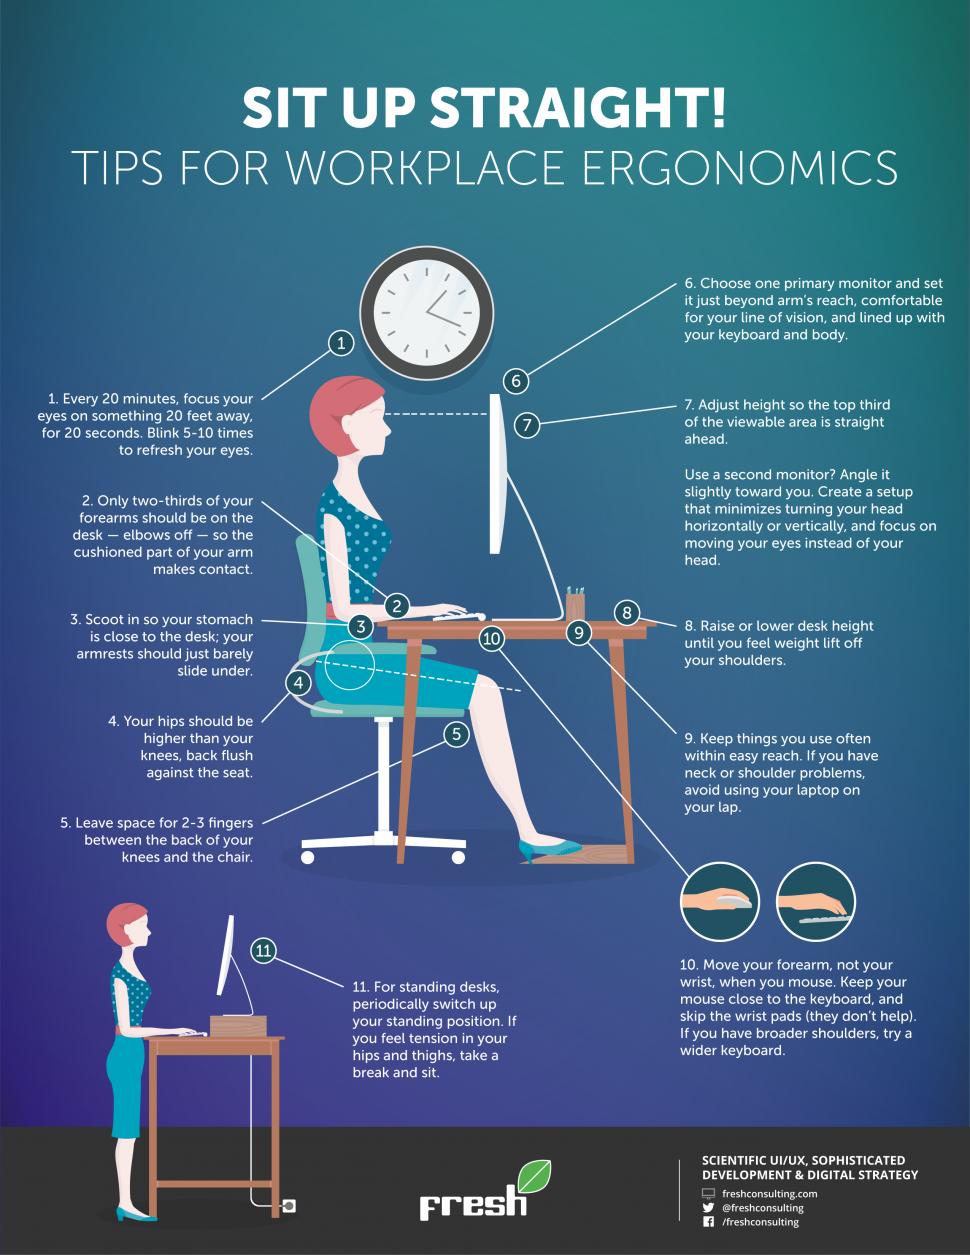 ergonomic workstation diagram auto transformer wiring pictures to pin on pinterest by eureka ergonomics desk workplace